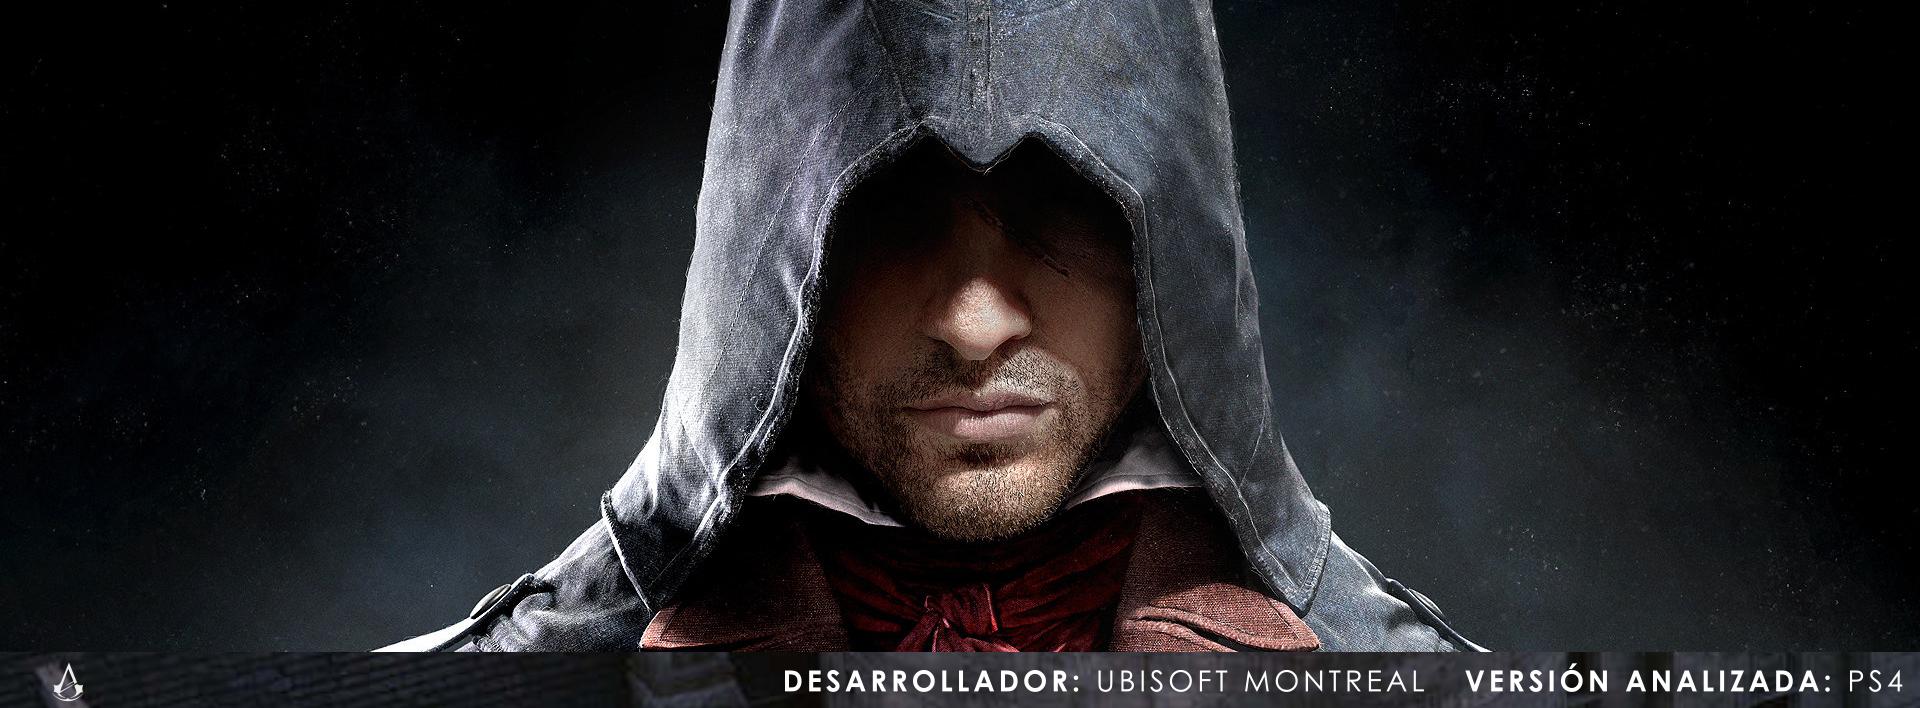 Assassins Creed Unity Header